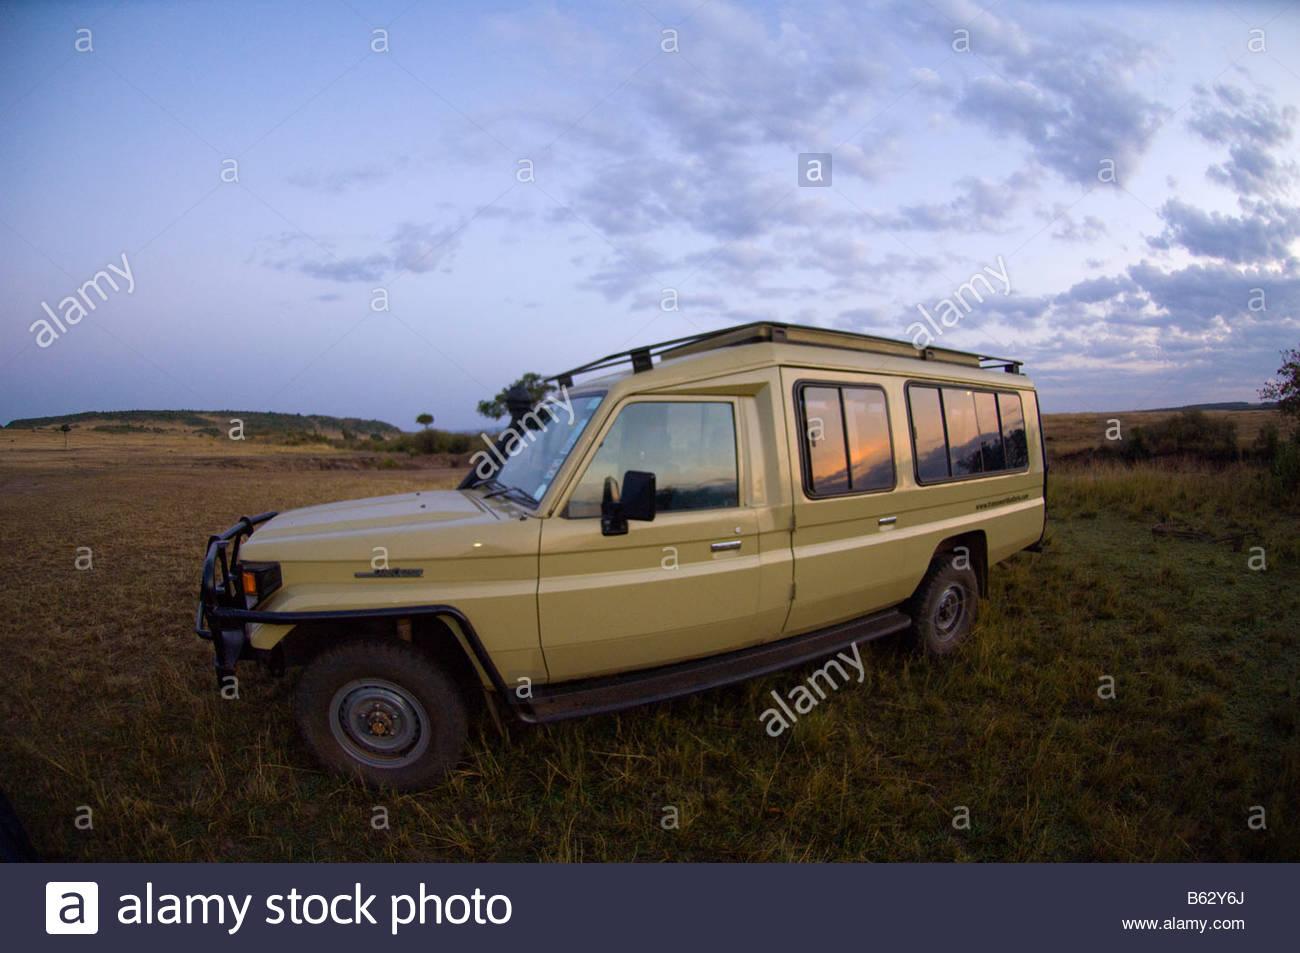 Sunrise reflected into the windows of a safari vehicle Masai Mara National Reserve Kenya - Stock Image